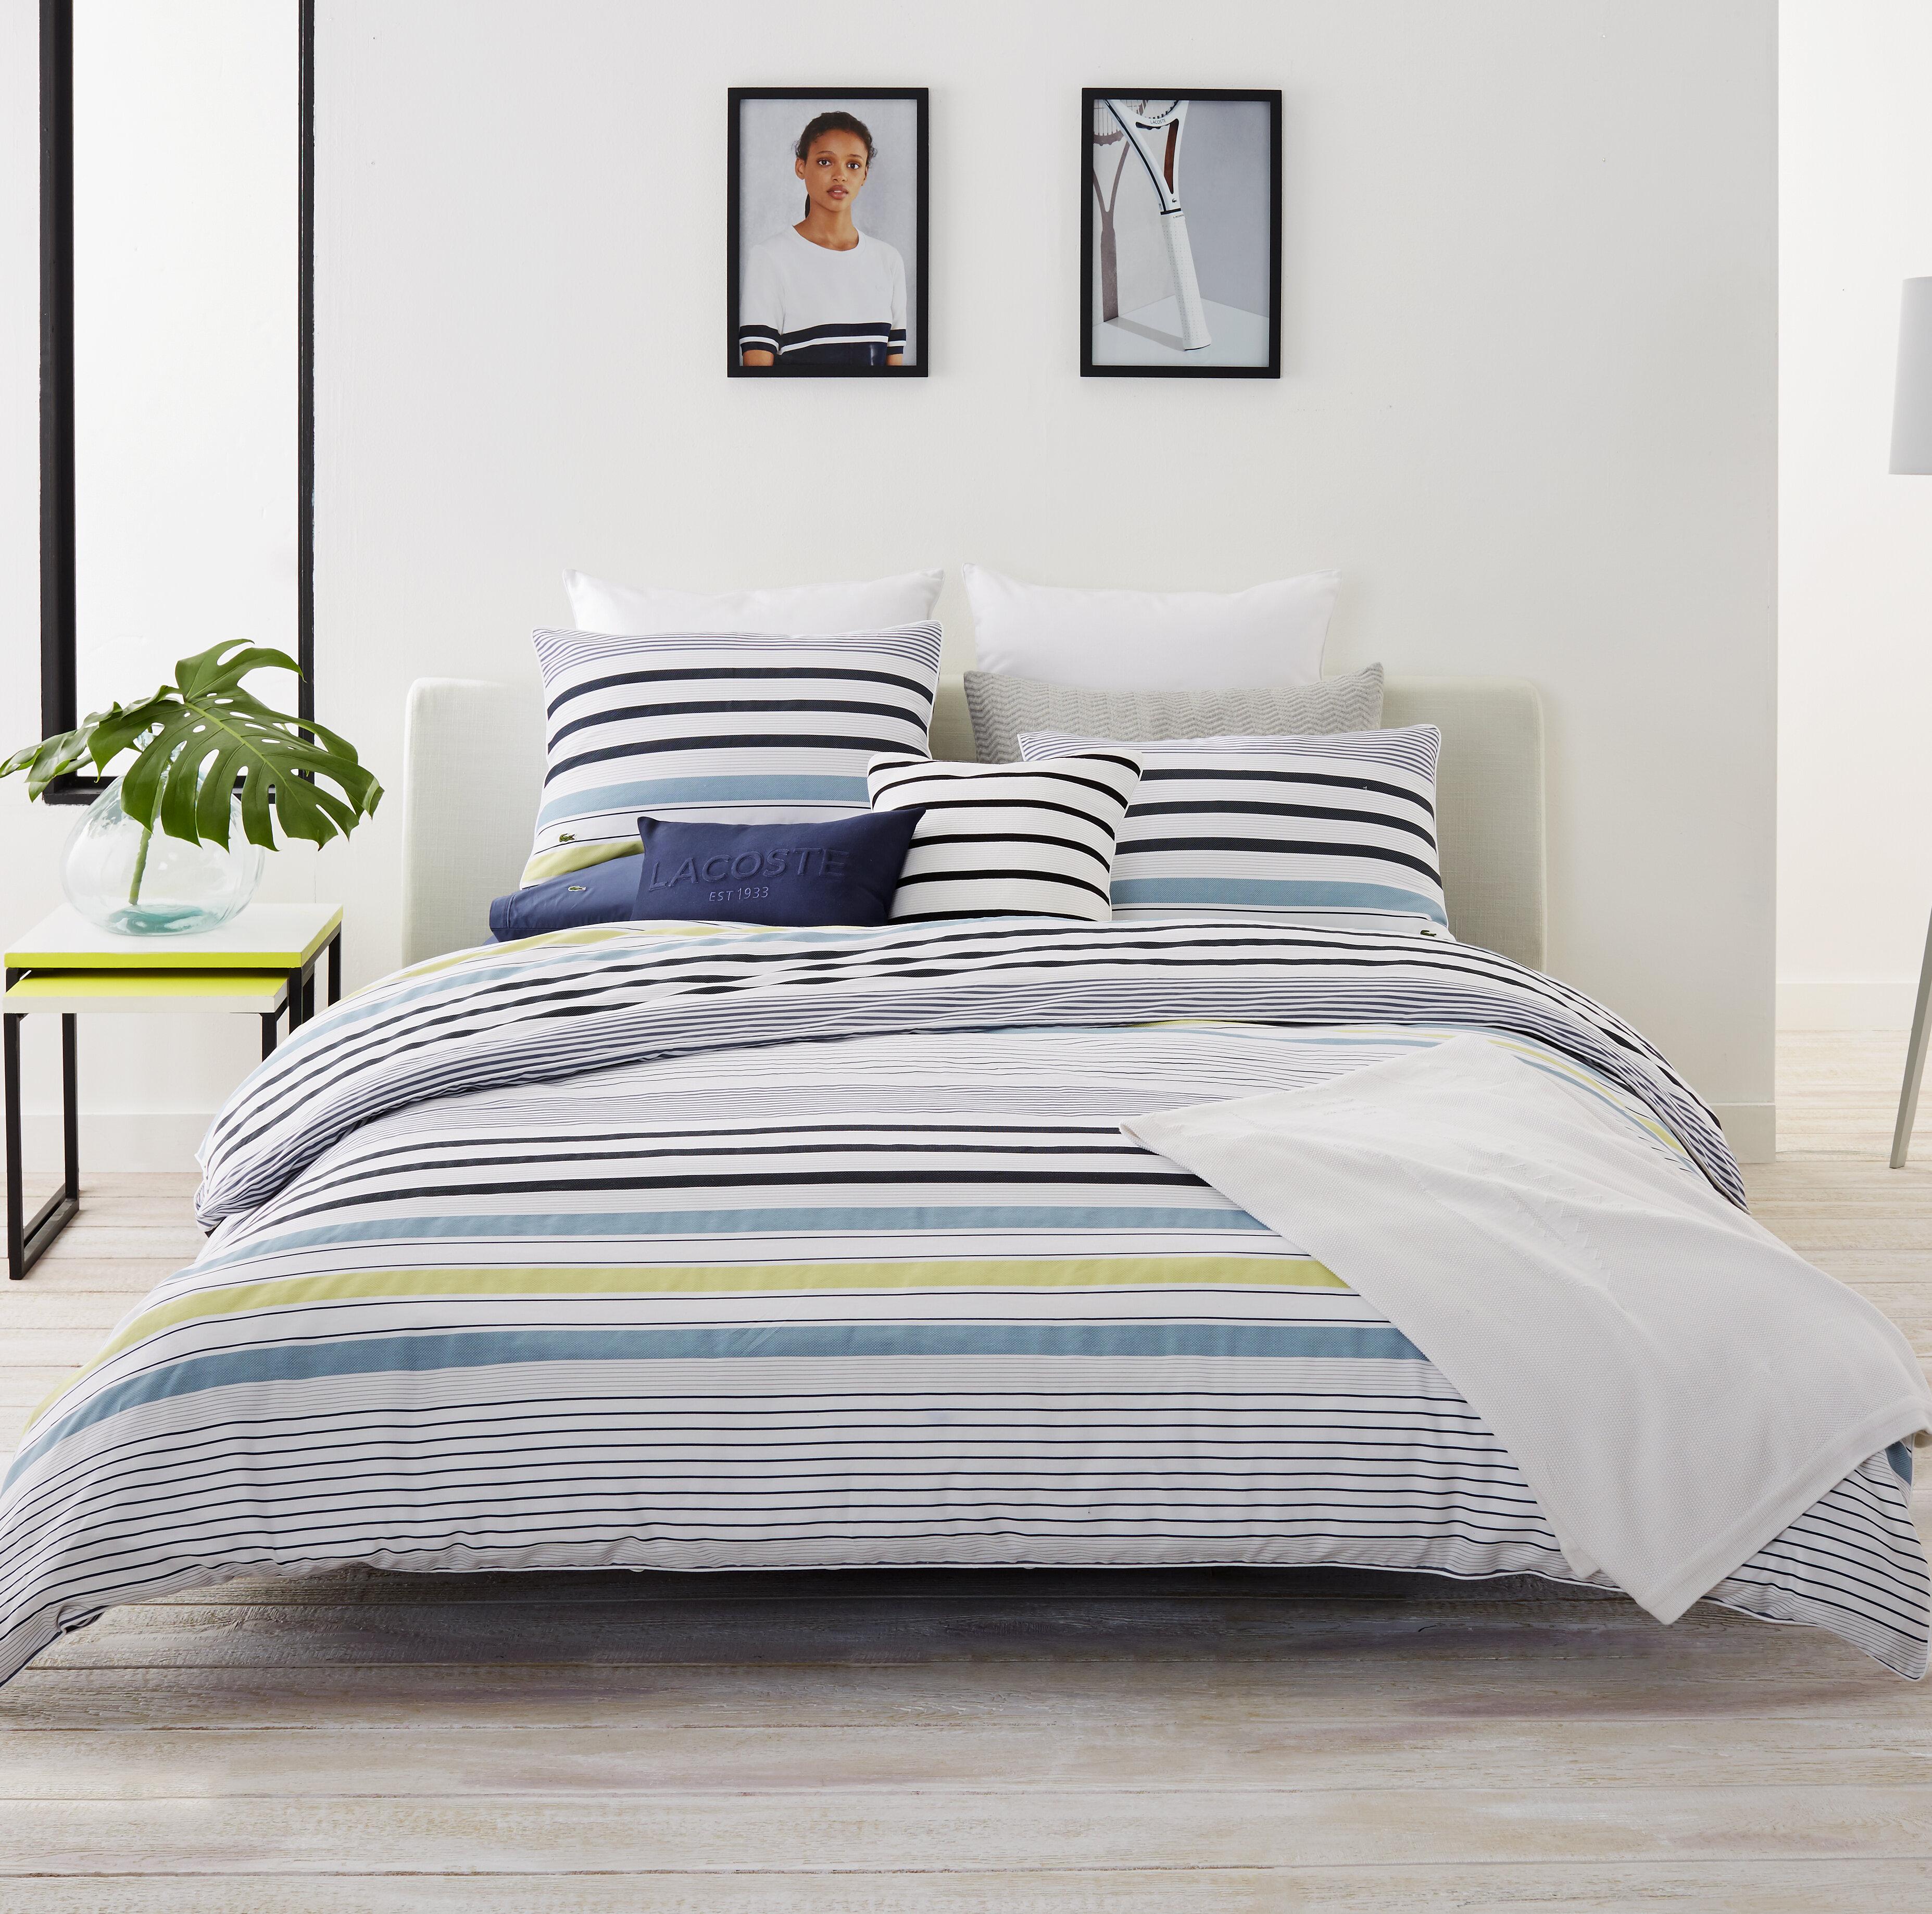 King Lacoste Antibes Comforter Set